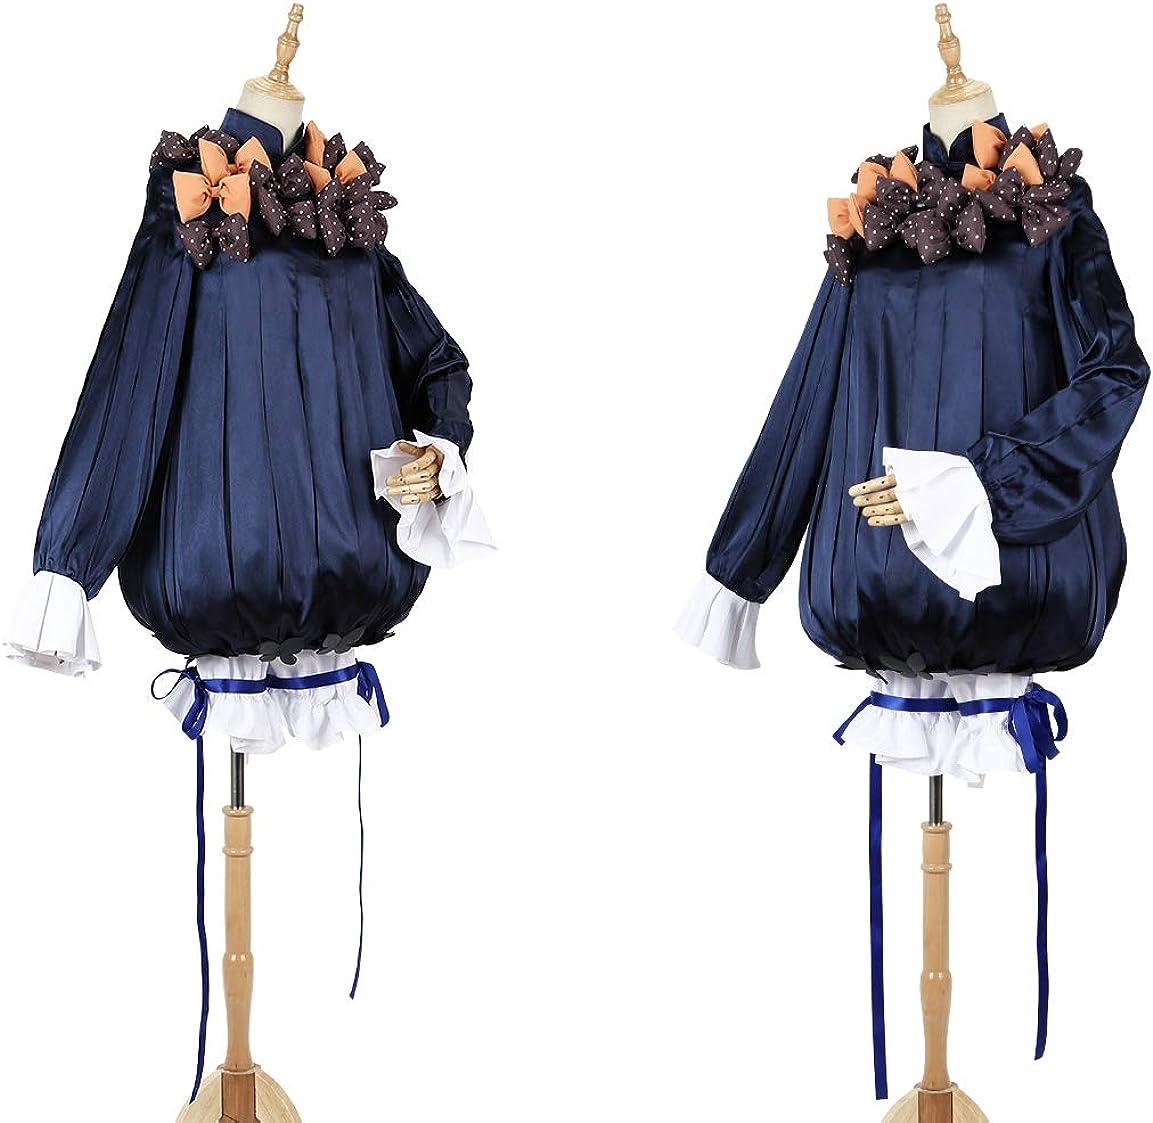 Fate/Grand Order FGO The Count of Monte Cristo Edmond Dantes Avenger Cosplay Costume